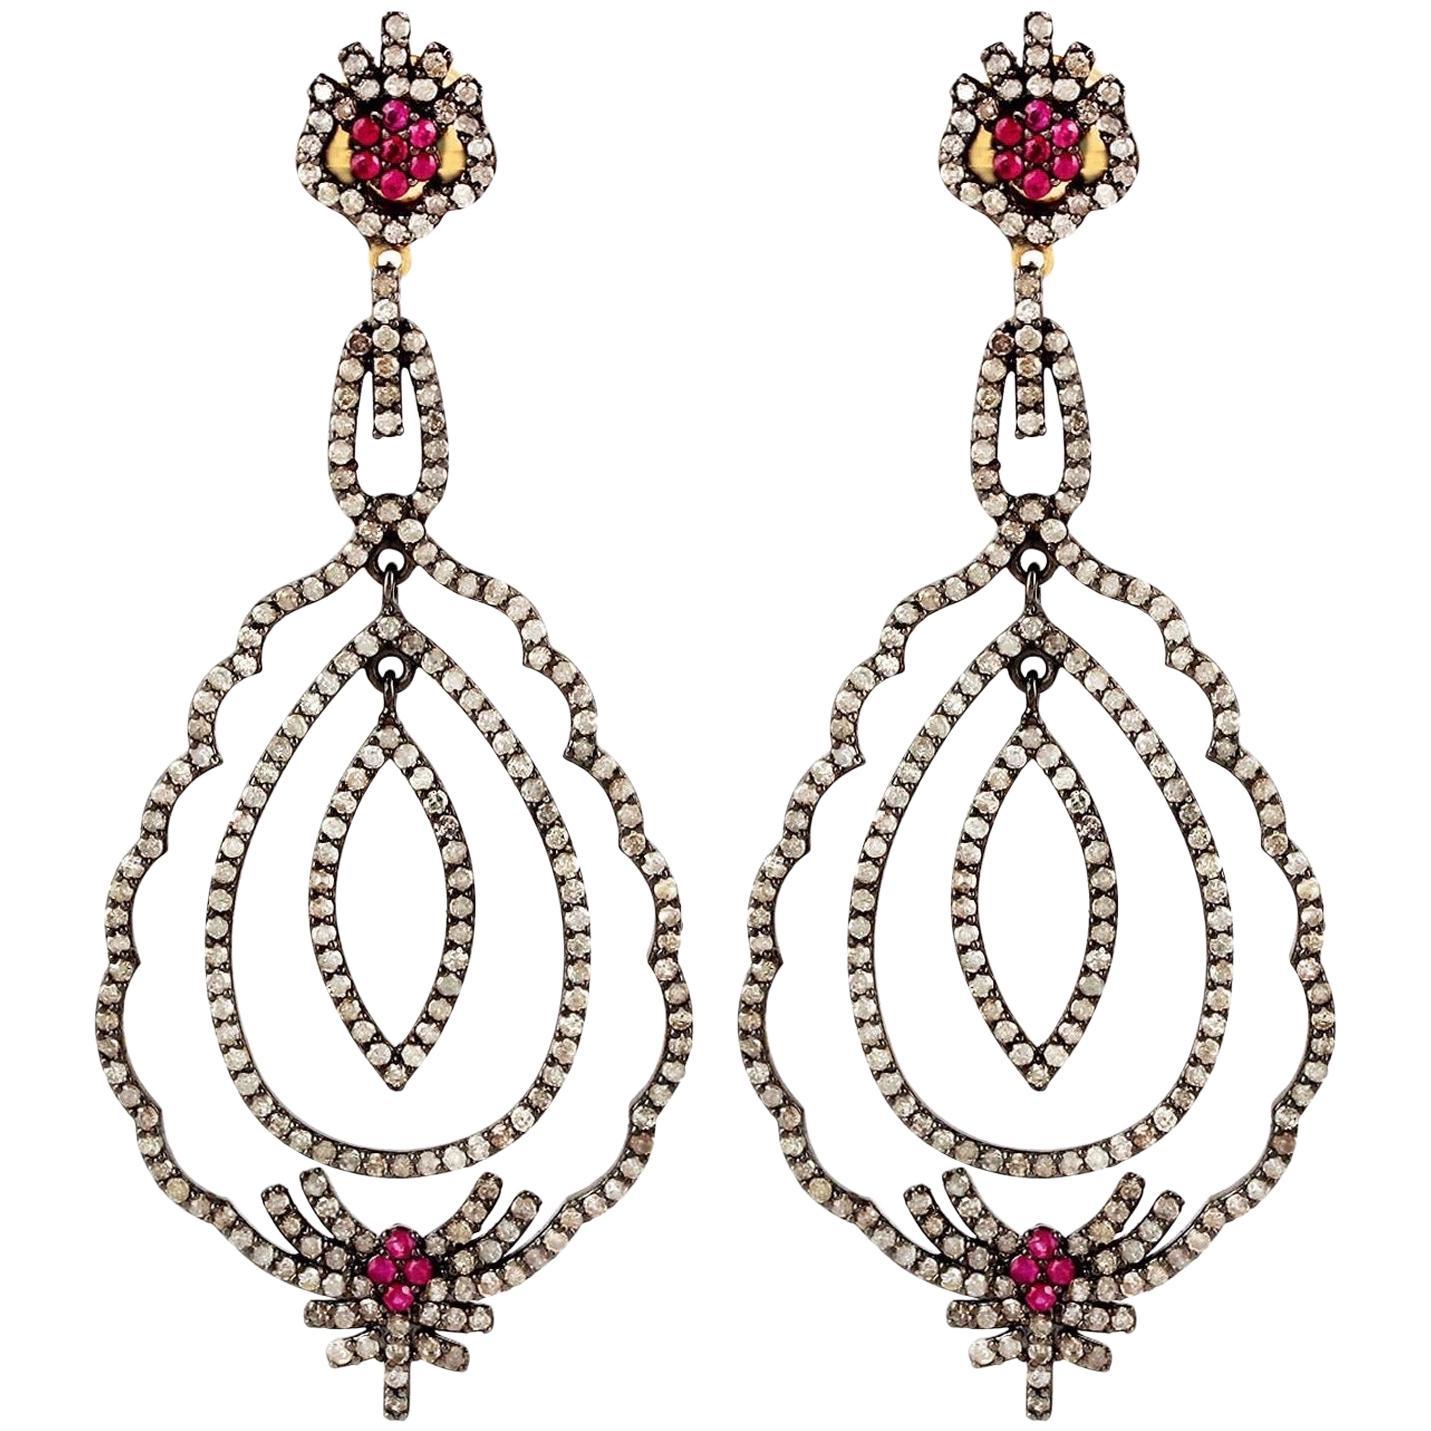 Antique Style Ruby Diamond Earrings